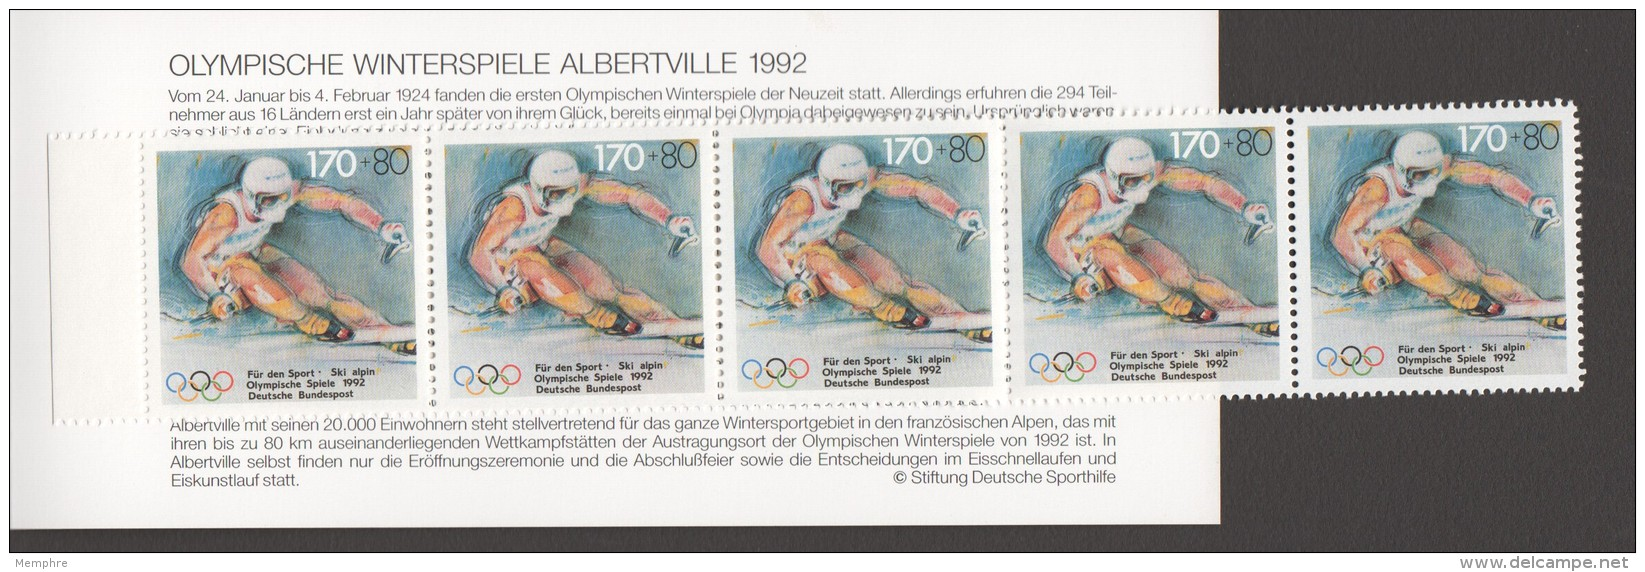 1992  Olympia-Markenheftchen  Ski Alpin - Slalom   MiNr 1595 X5 Postfrisch - BRD